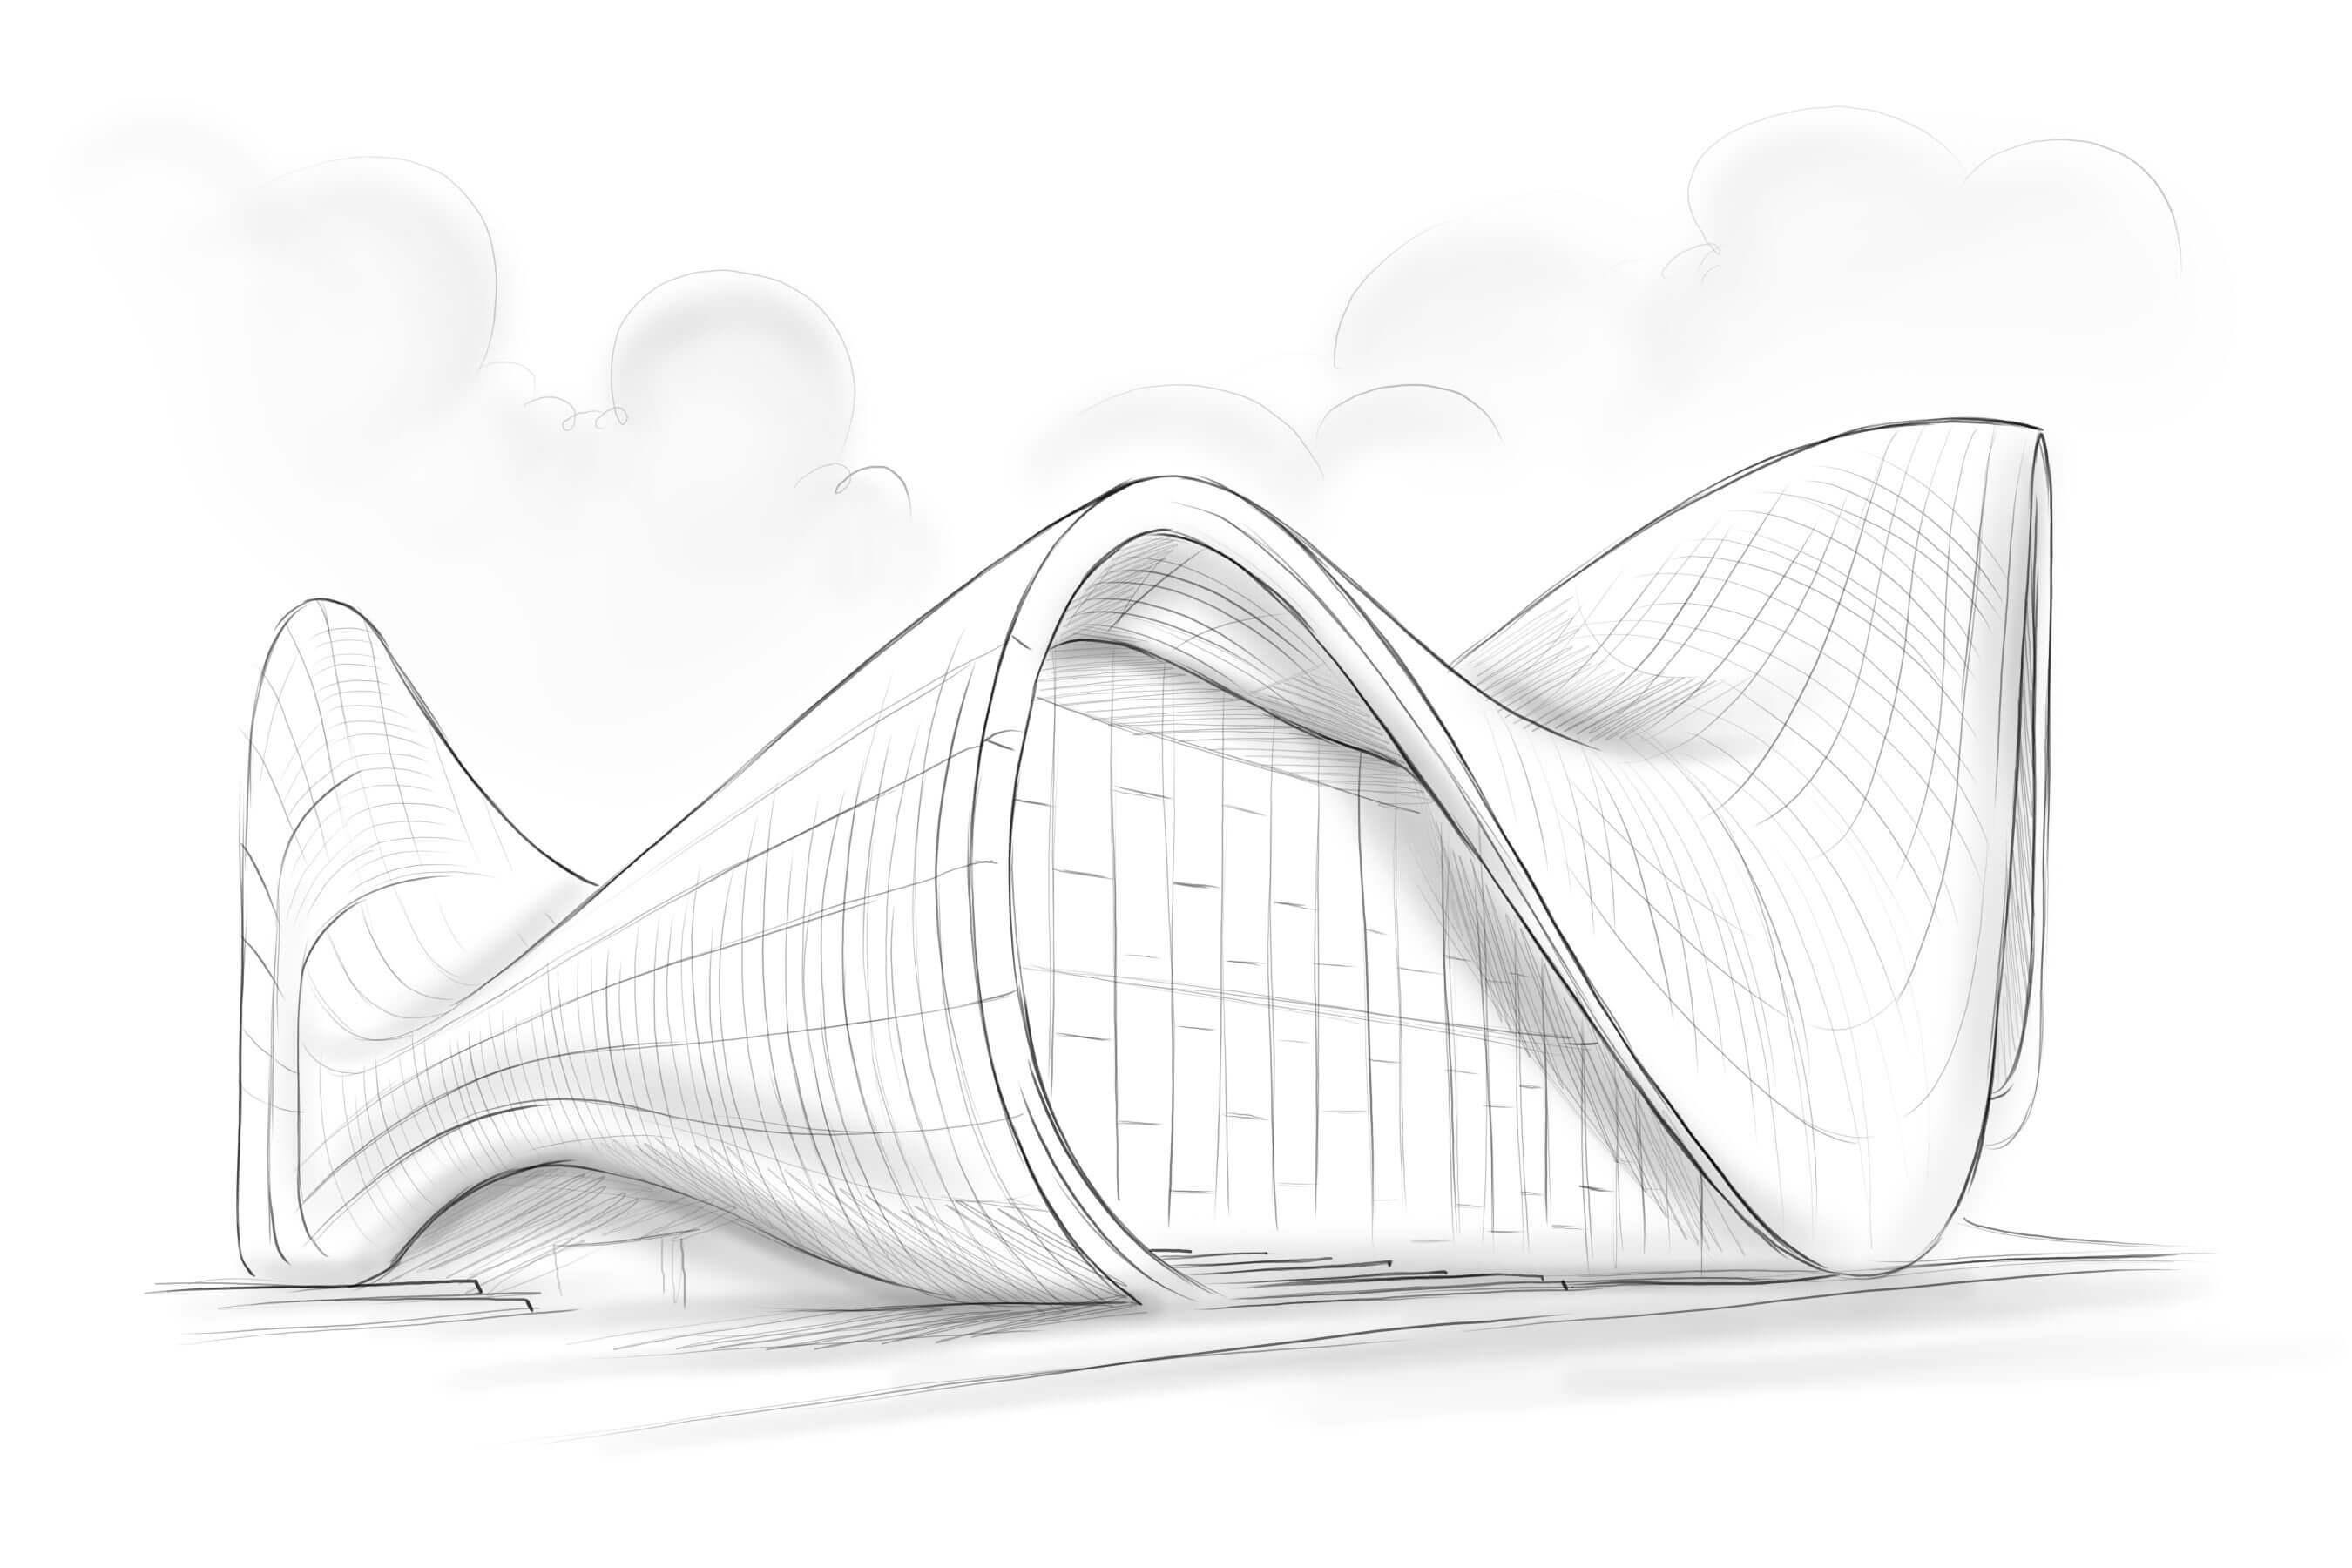 ZAHA HADID'S BUILDING DESIGN: DUBAI OPERA